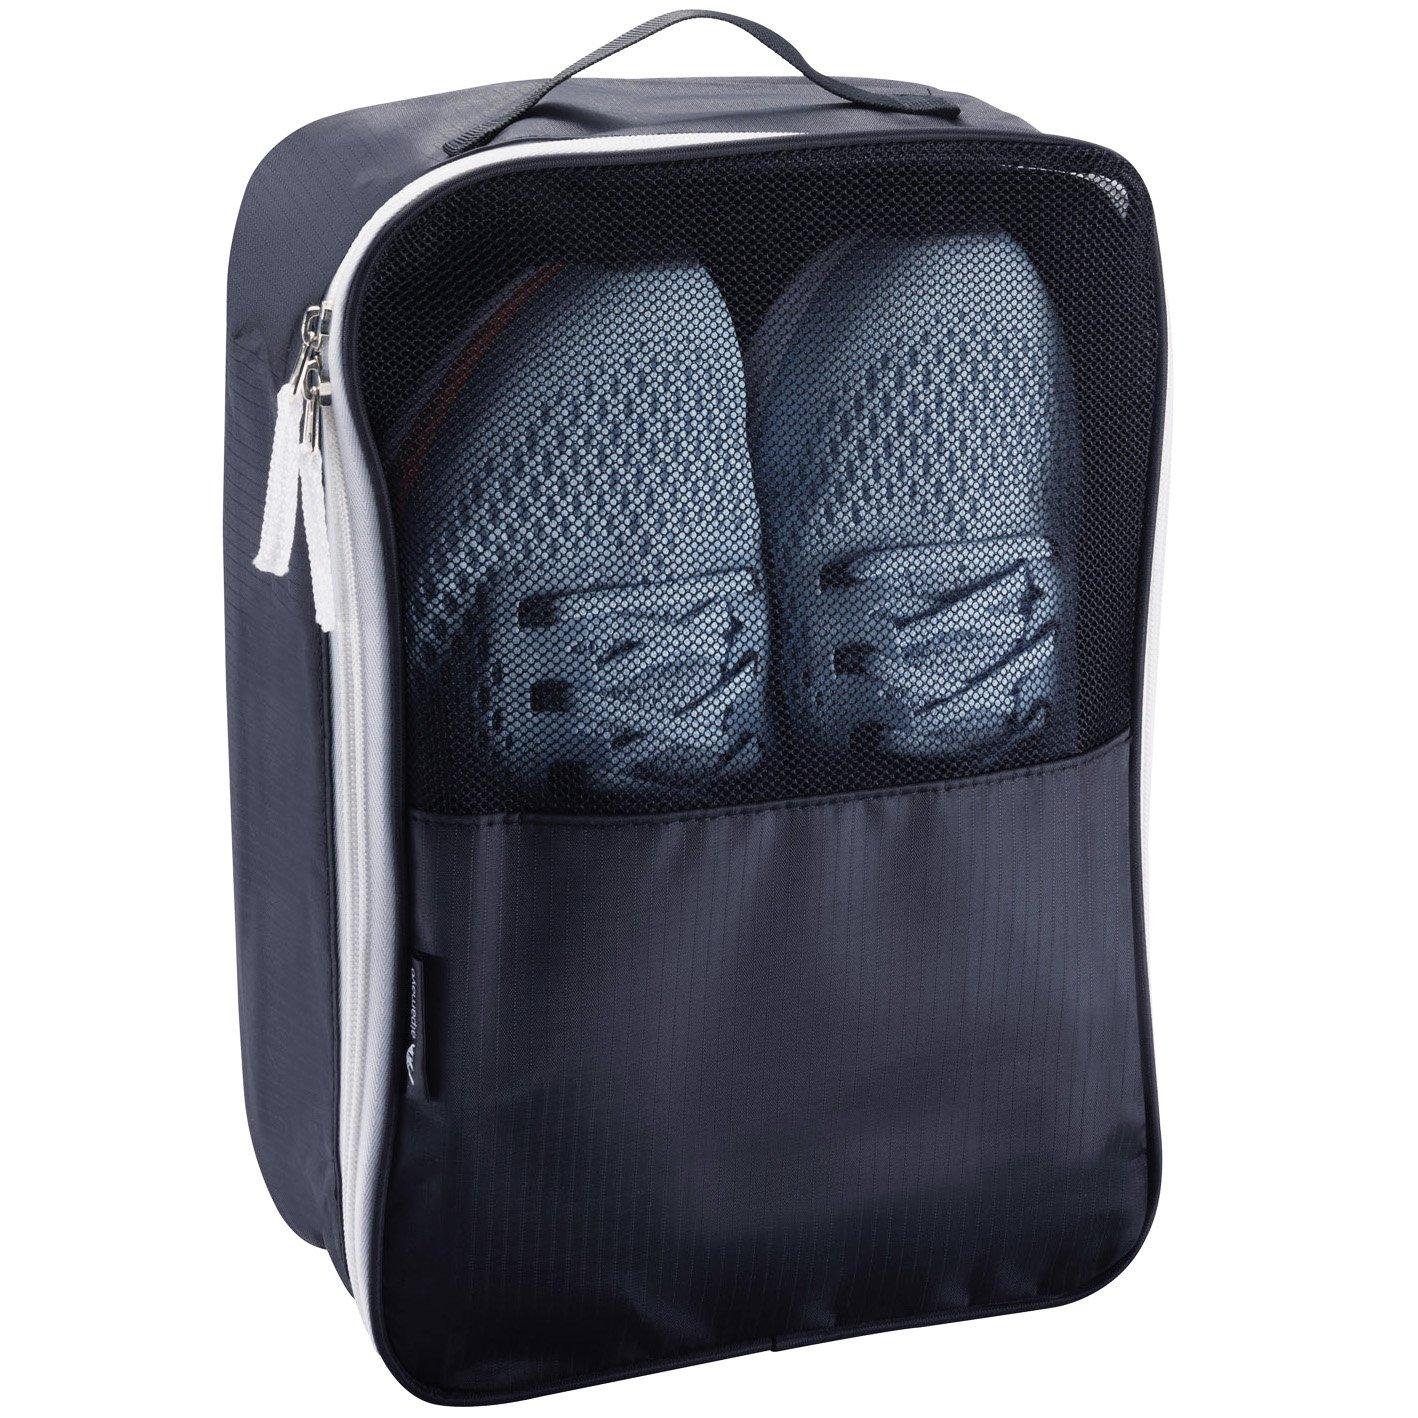 Alpamayo® bolsa para zapatos, bolsa transpirable para zapatos, ideal para deportes o viajes, fácil almacenamiento en bolsas deportivas, maletas o equipaje de mano, color negro ALP-SHO2